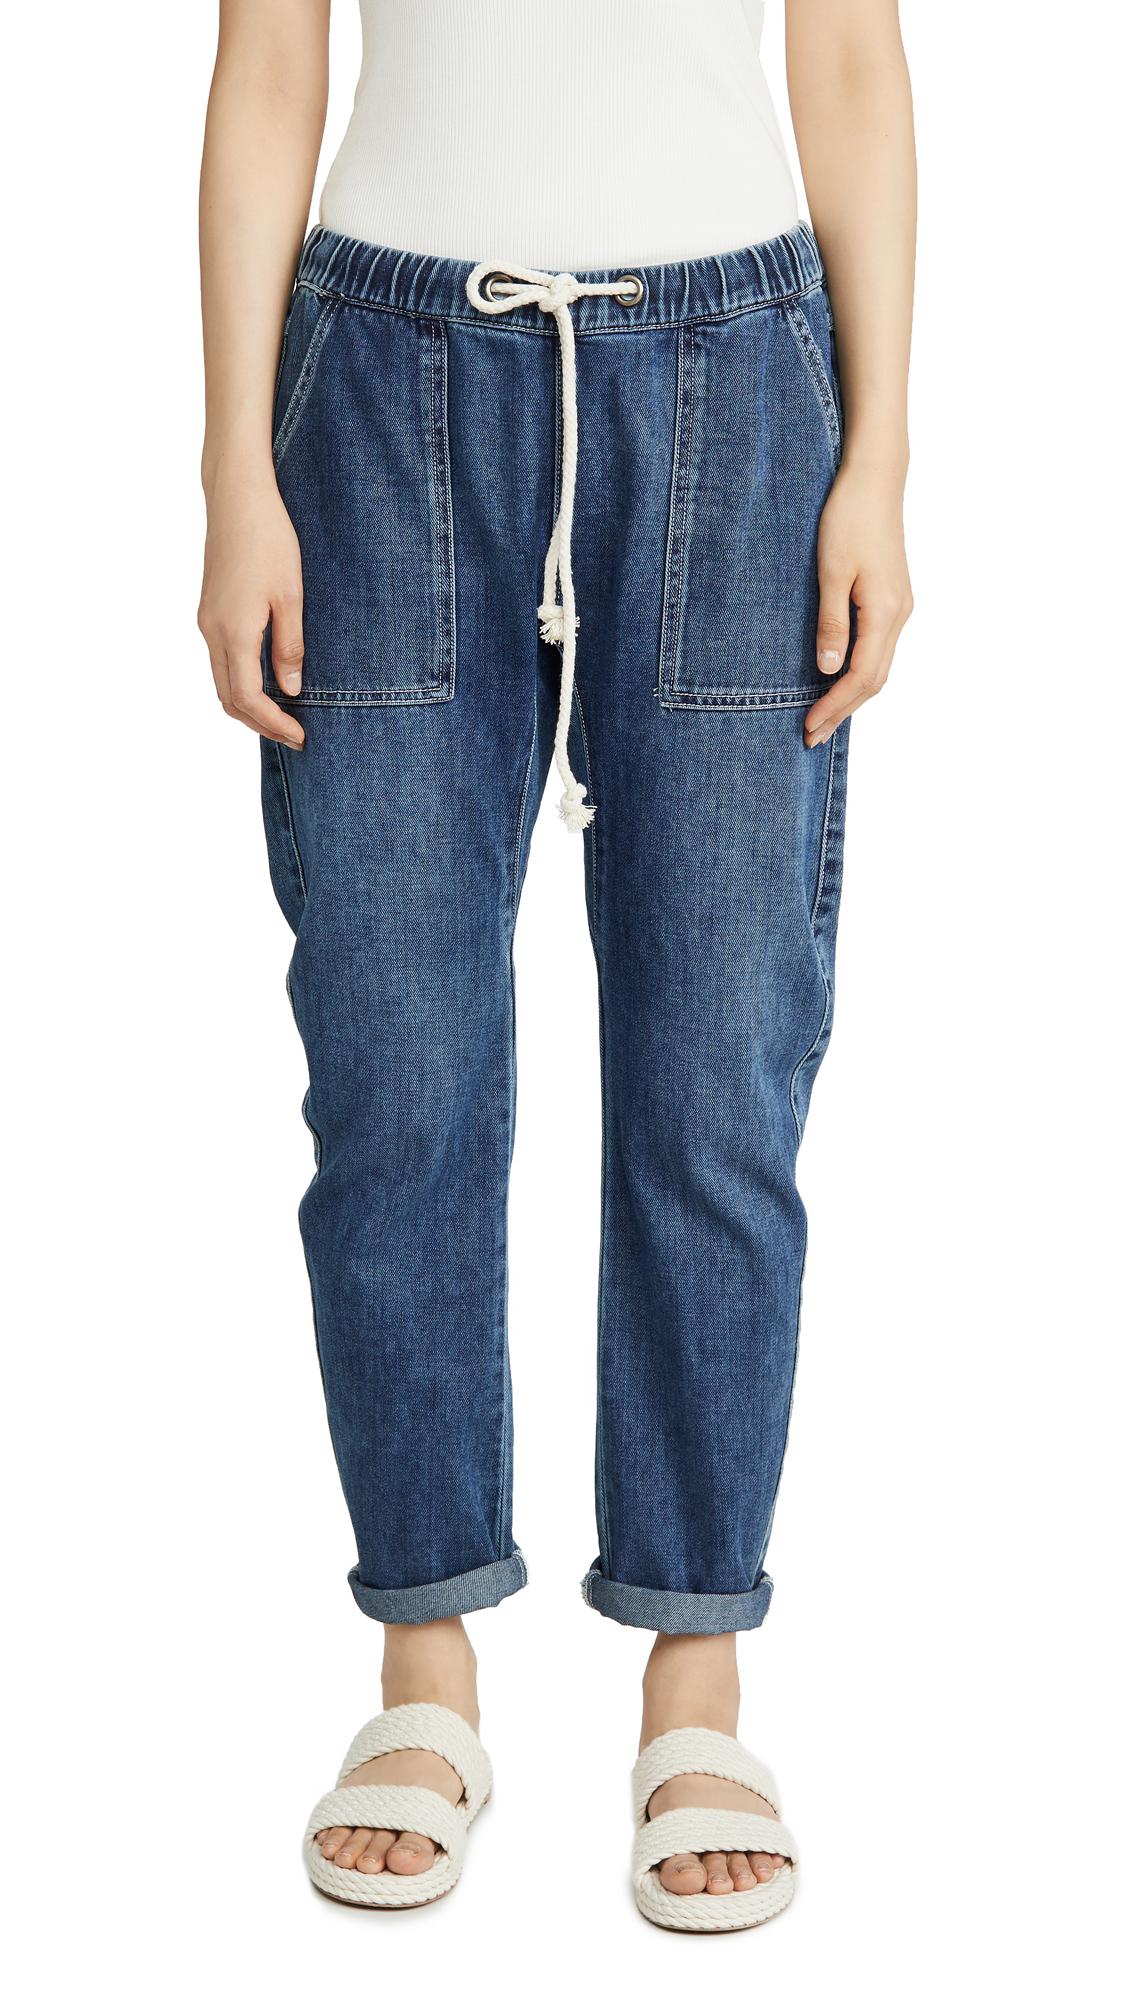 One Teaspoon Shabbies Boyfriend Jeans